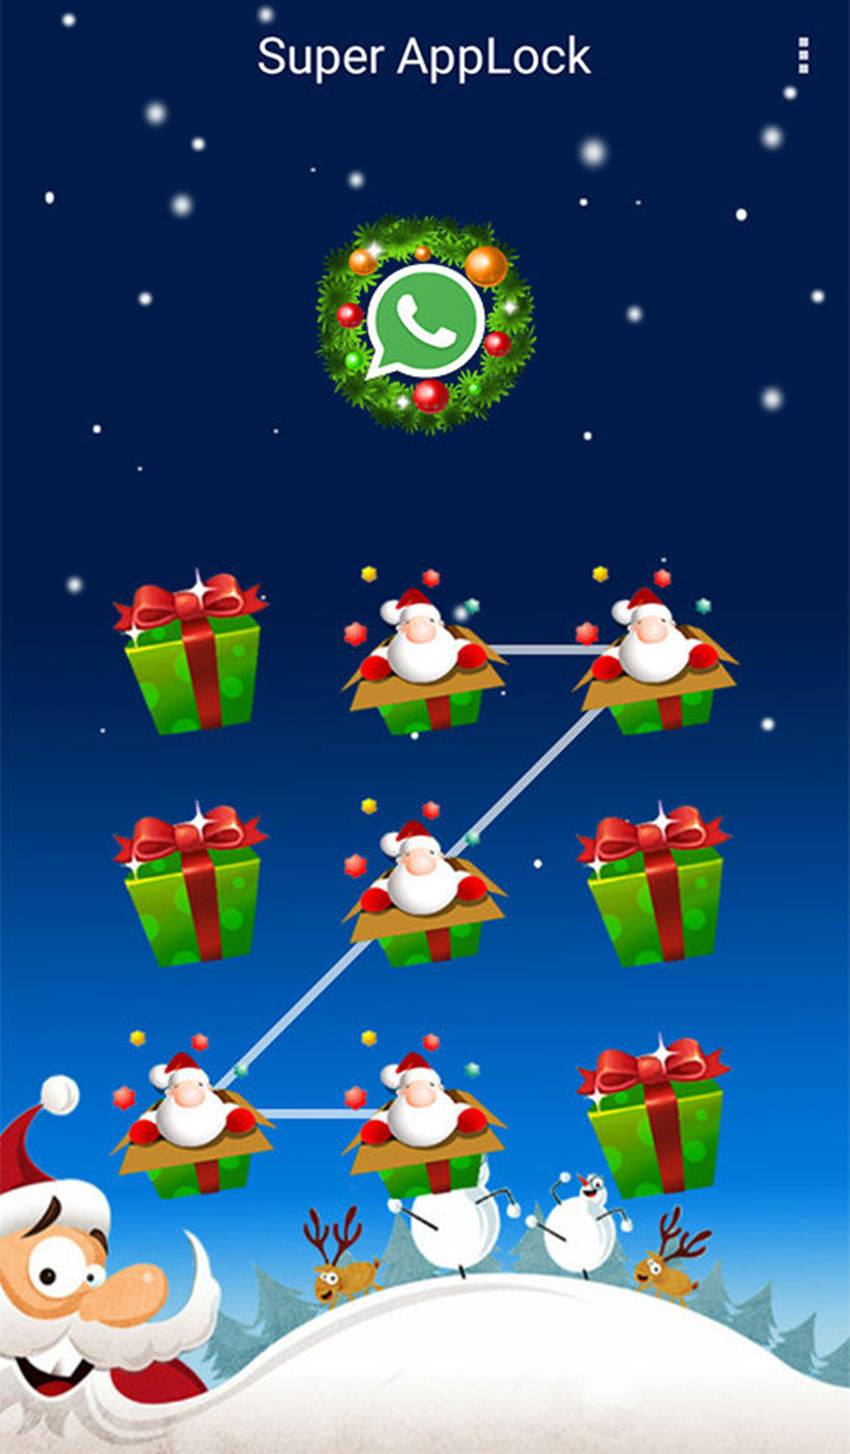 AppLock Theme Xmas Gift Wish Screenshot 2